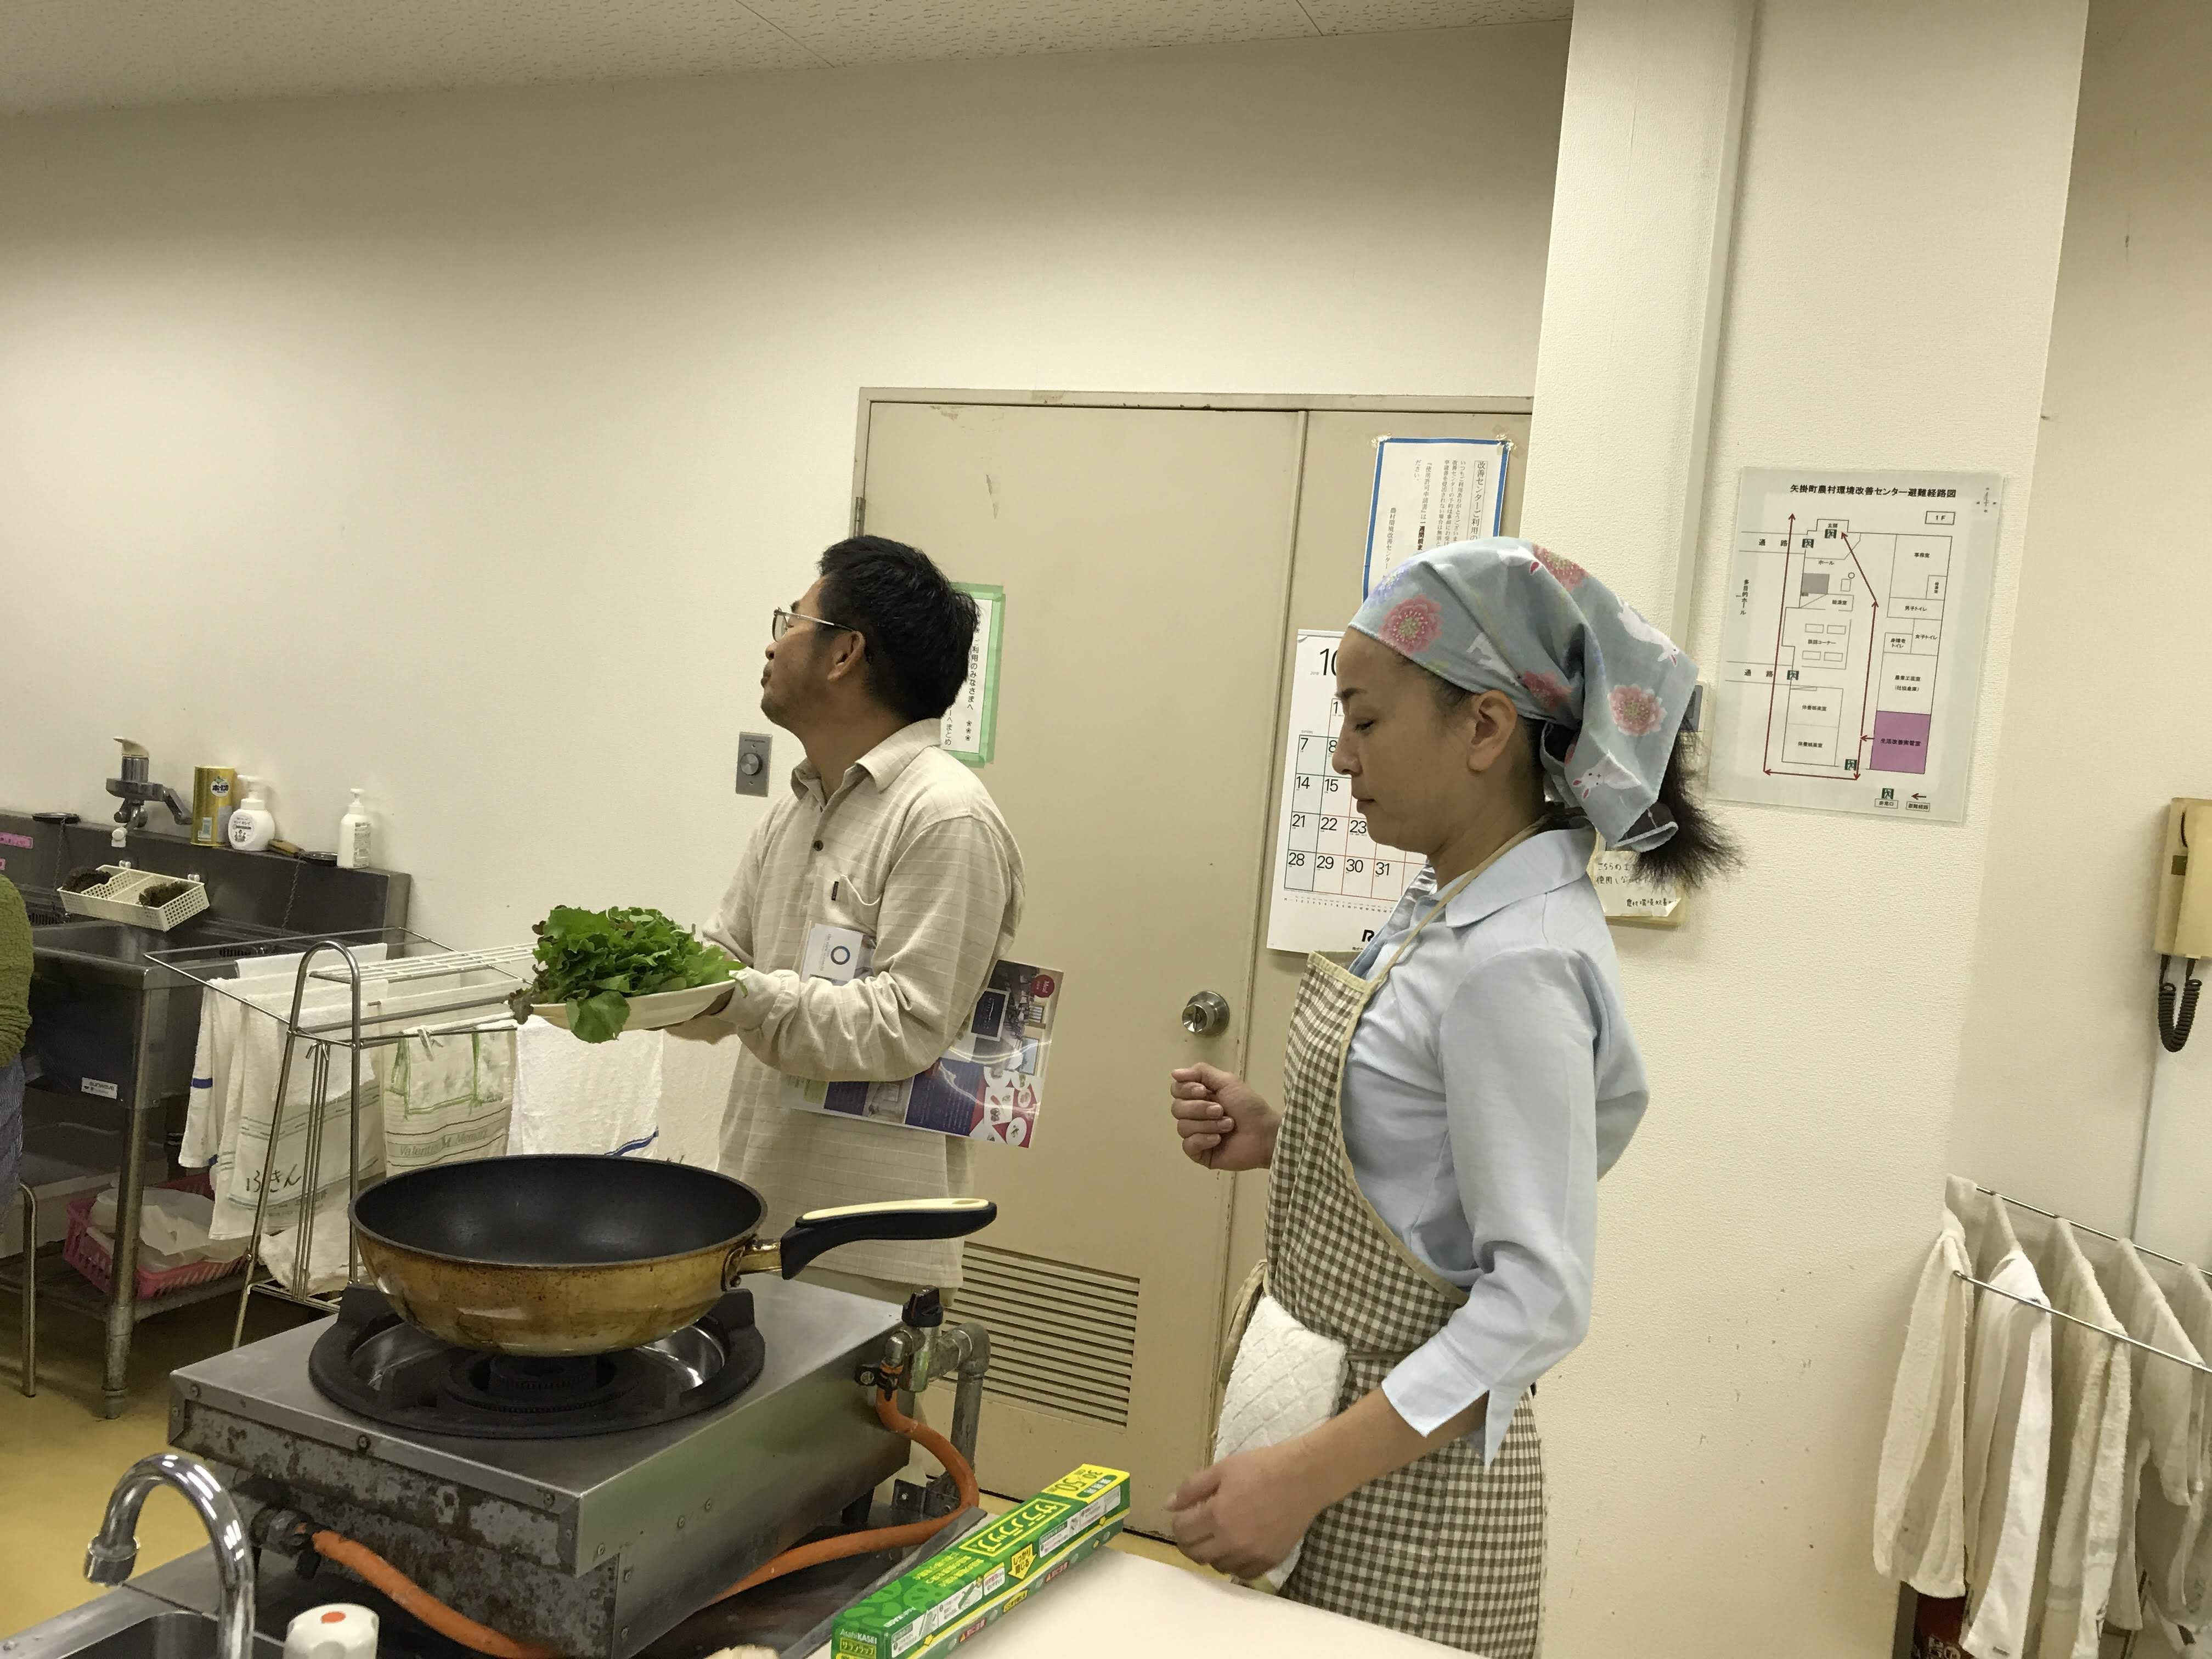 無農薬野菜生産者の話